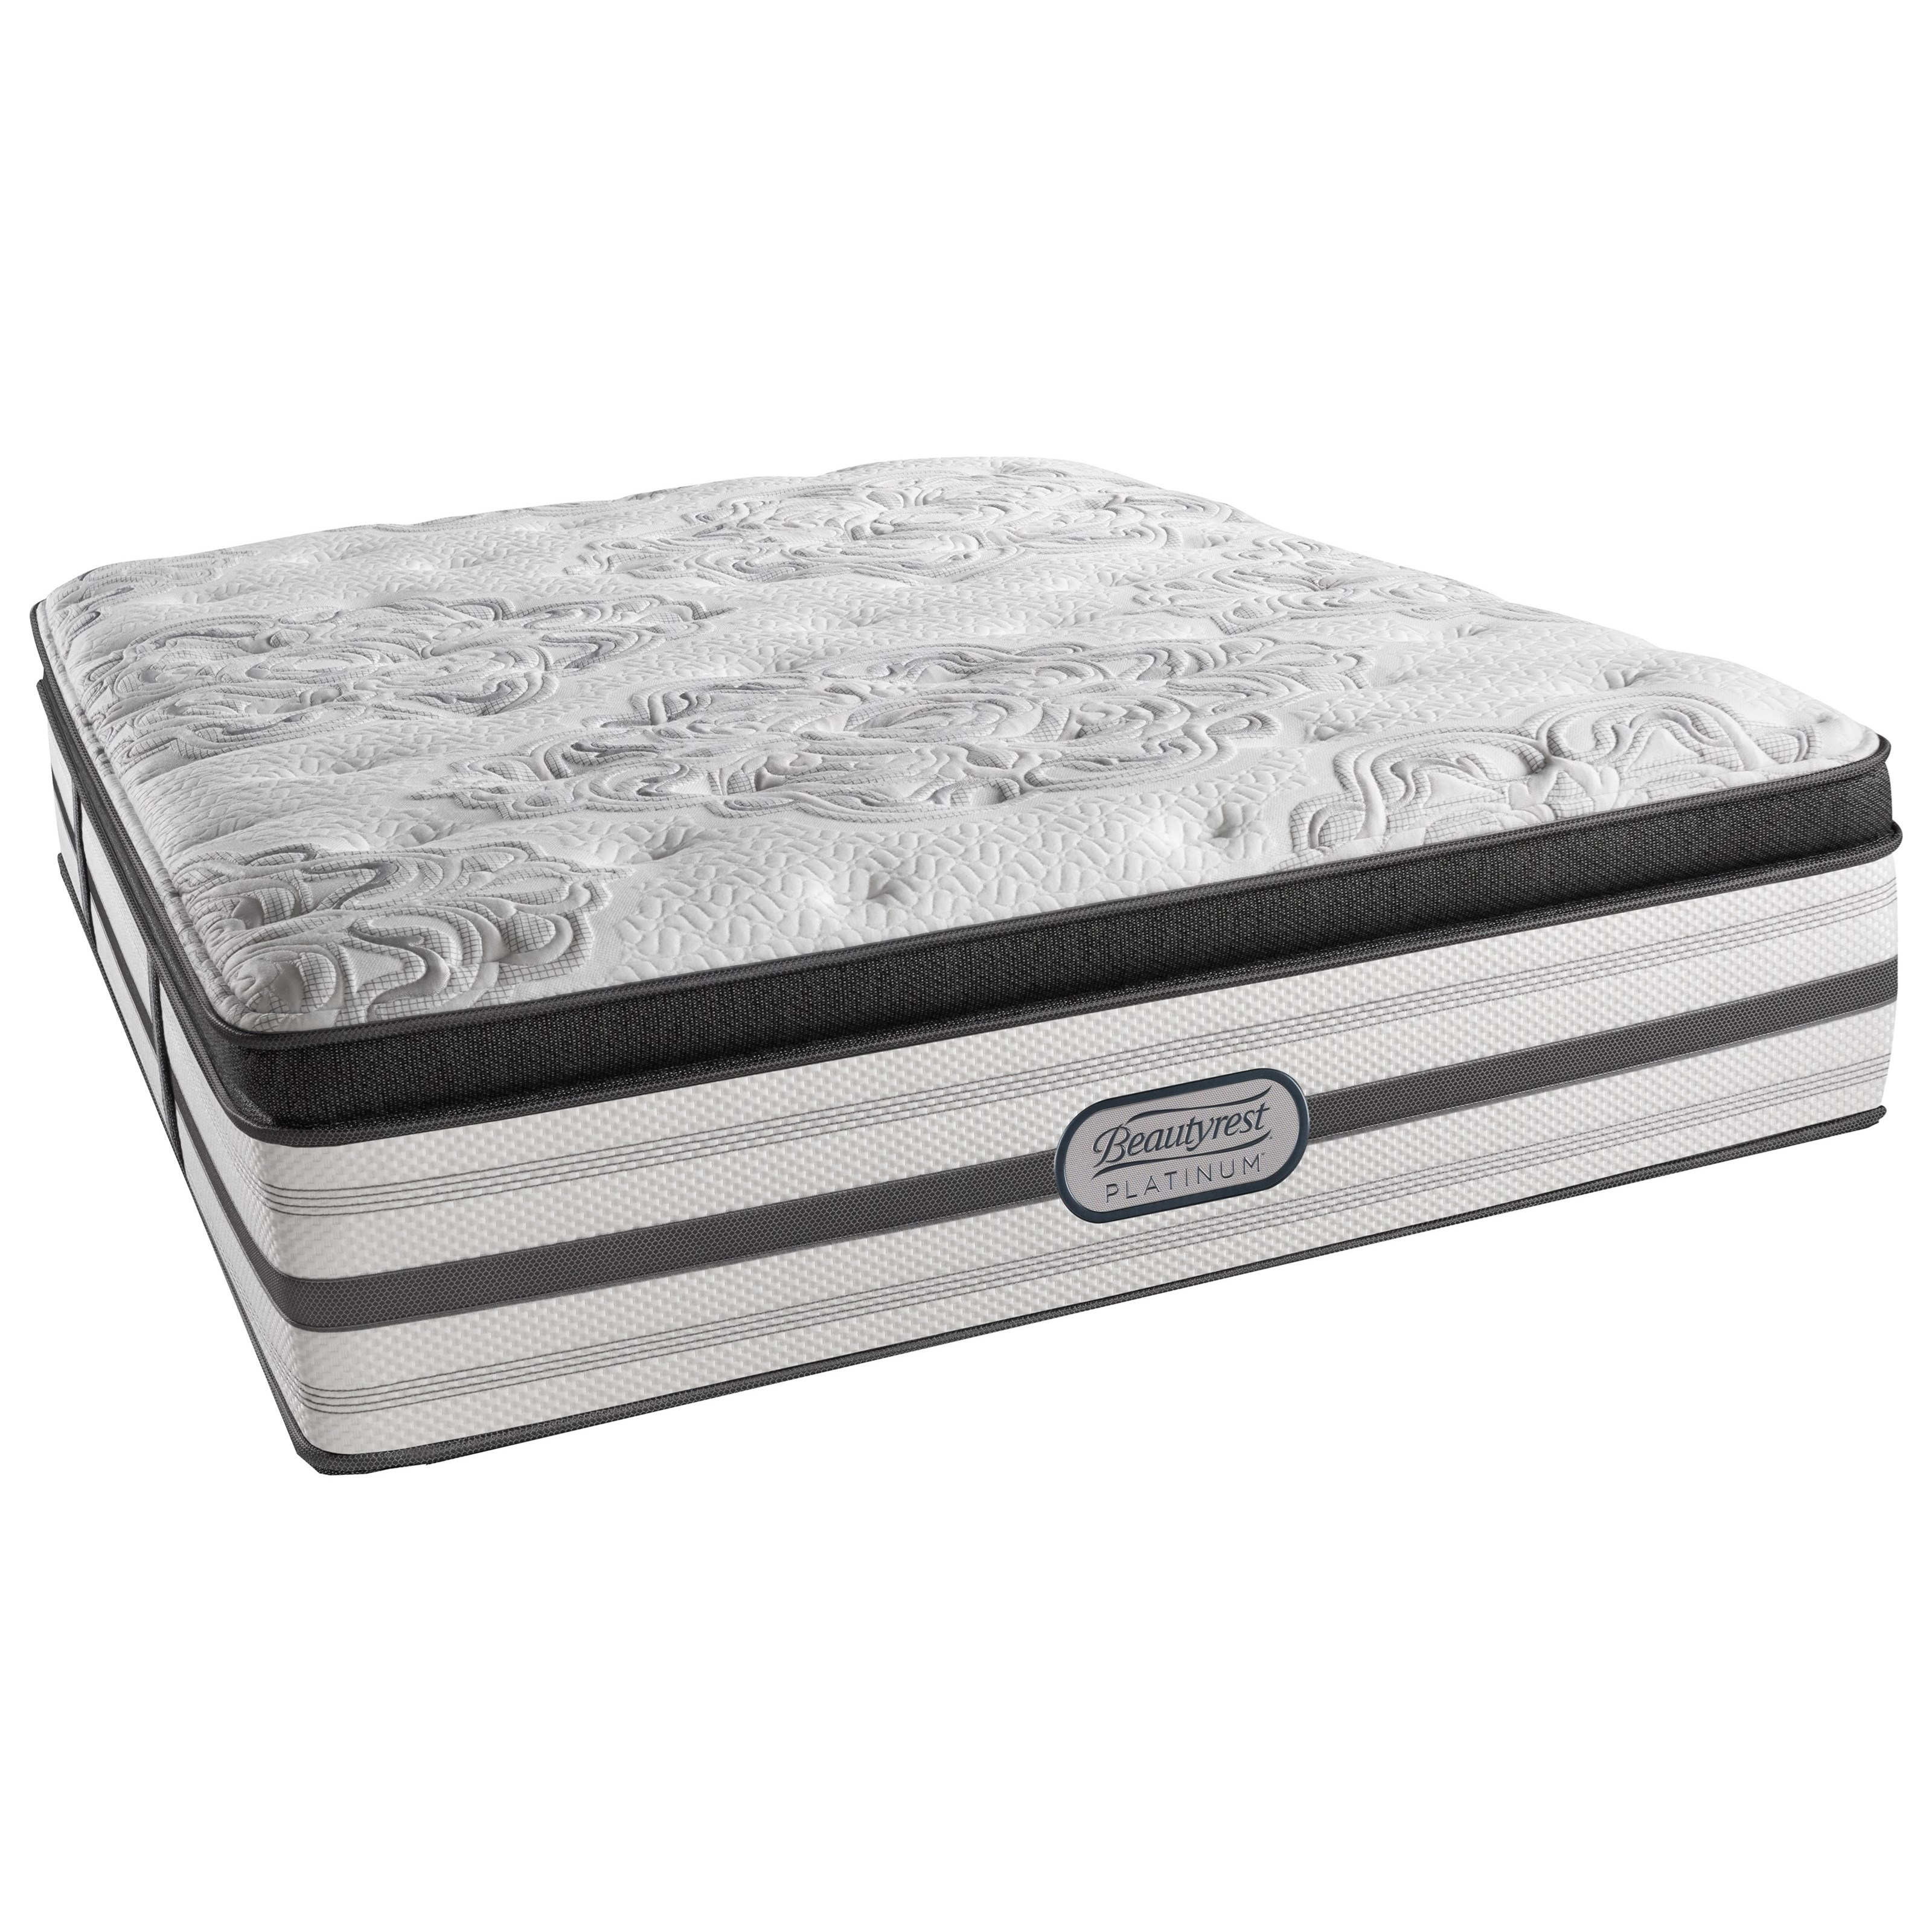 "Beautyrest Platinum Katherine Queen Plush Box PT 16 1/2"" Mattress - Item Number: LV4PLBT-Q"